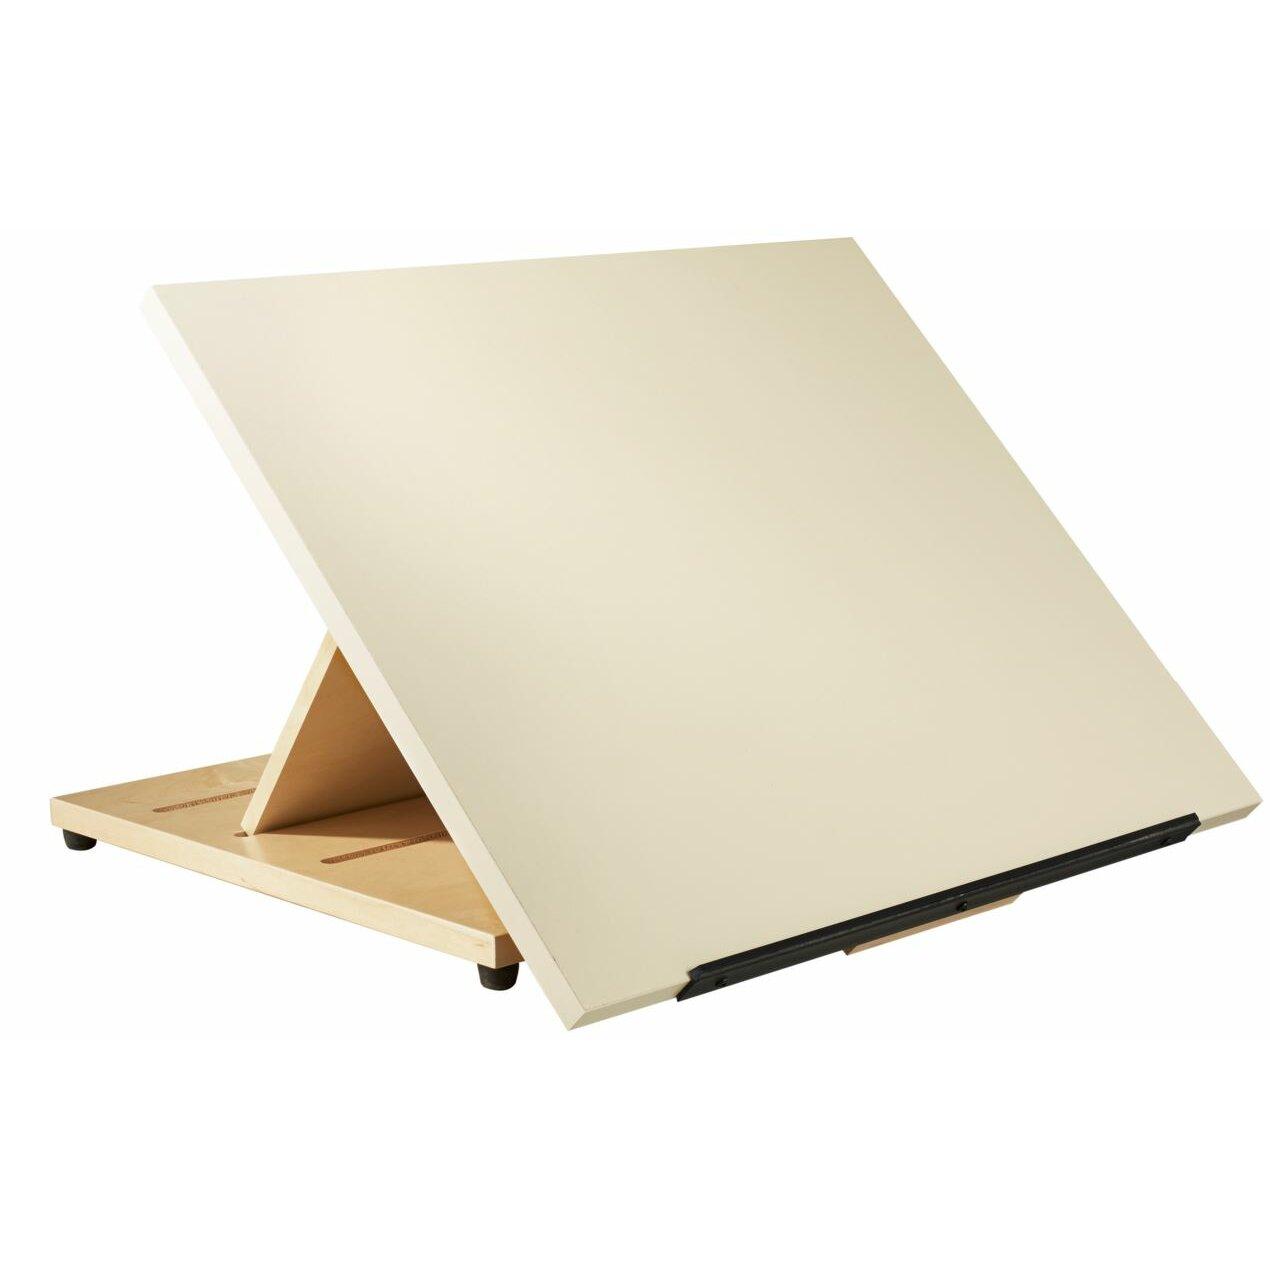 Shain Laminate Drafting Table Wayfair : Shain Portable Drafting Table 24w x 20d x 3h Almond PDT2420 from www.wayfair.com size 1270 x 1270 jpeg 39kB